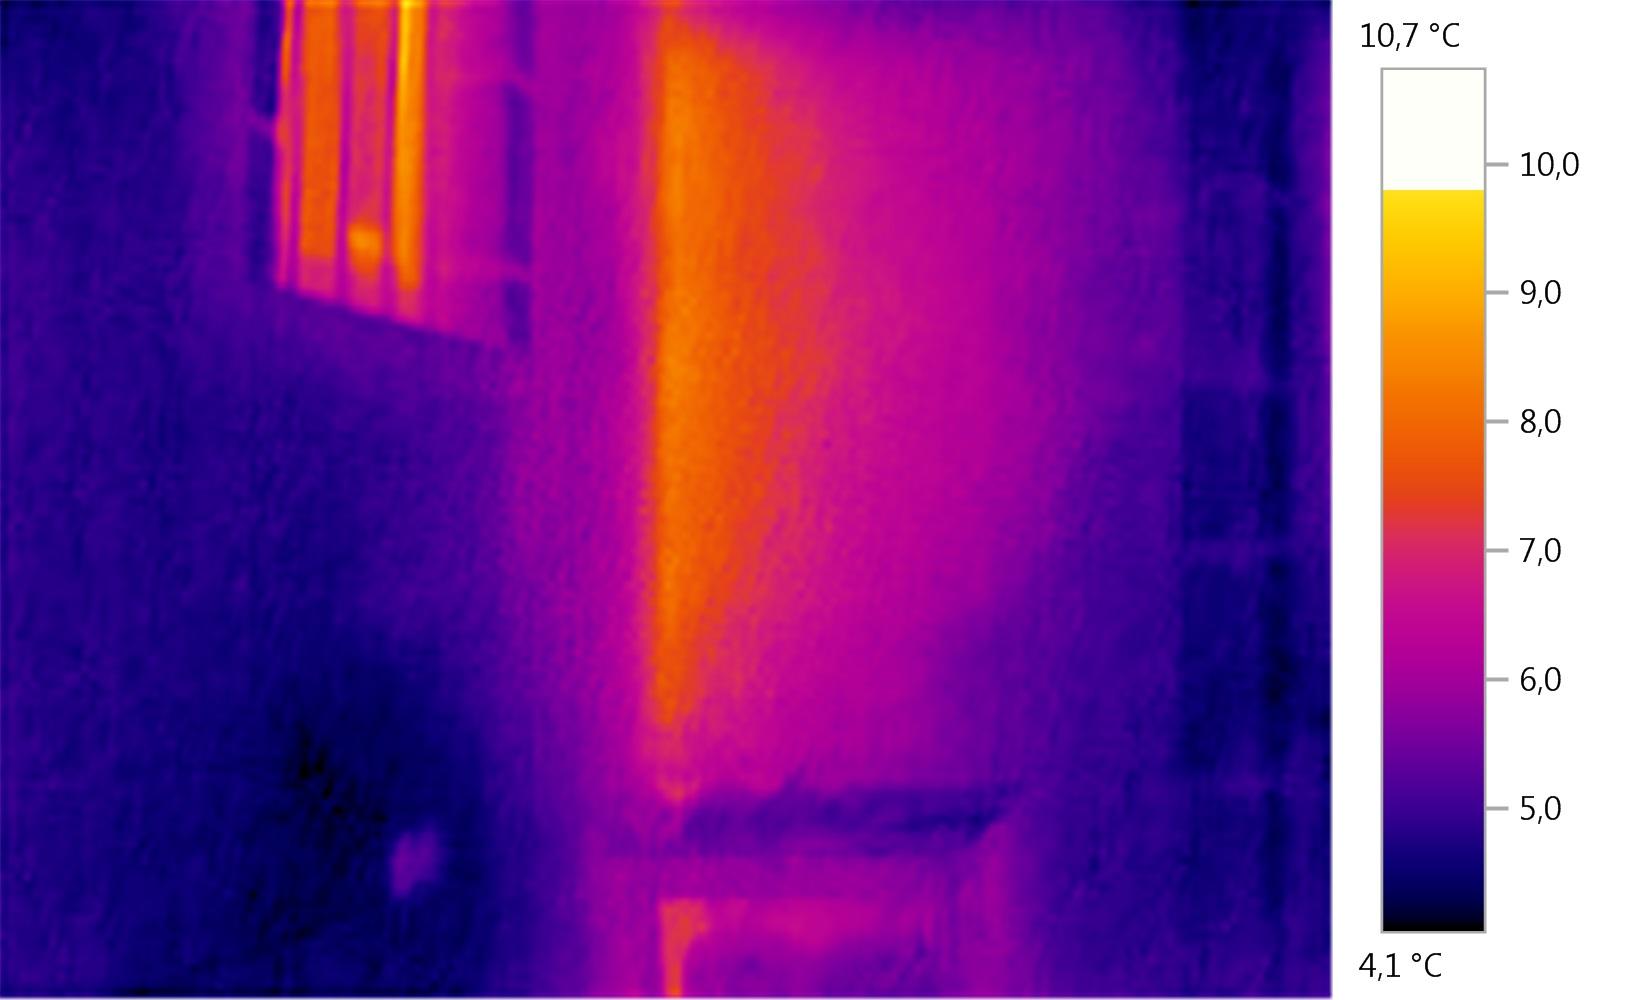 image thermique auvergne